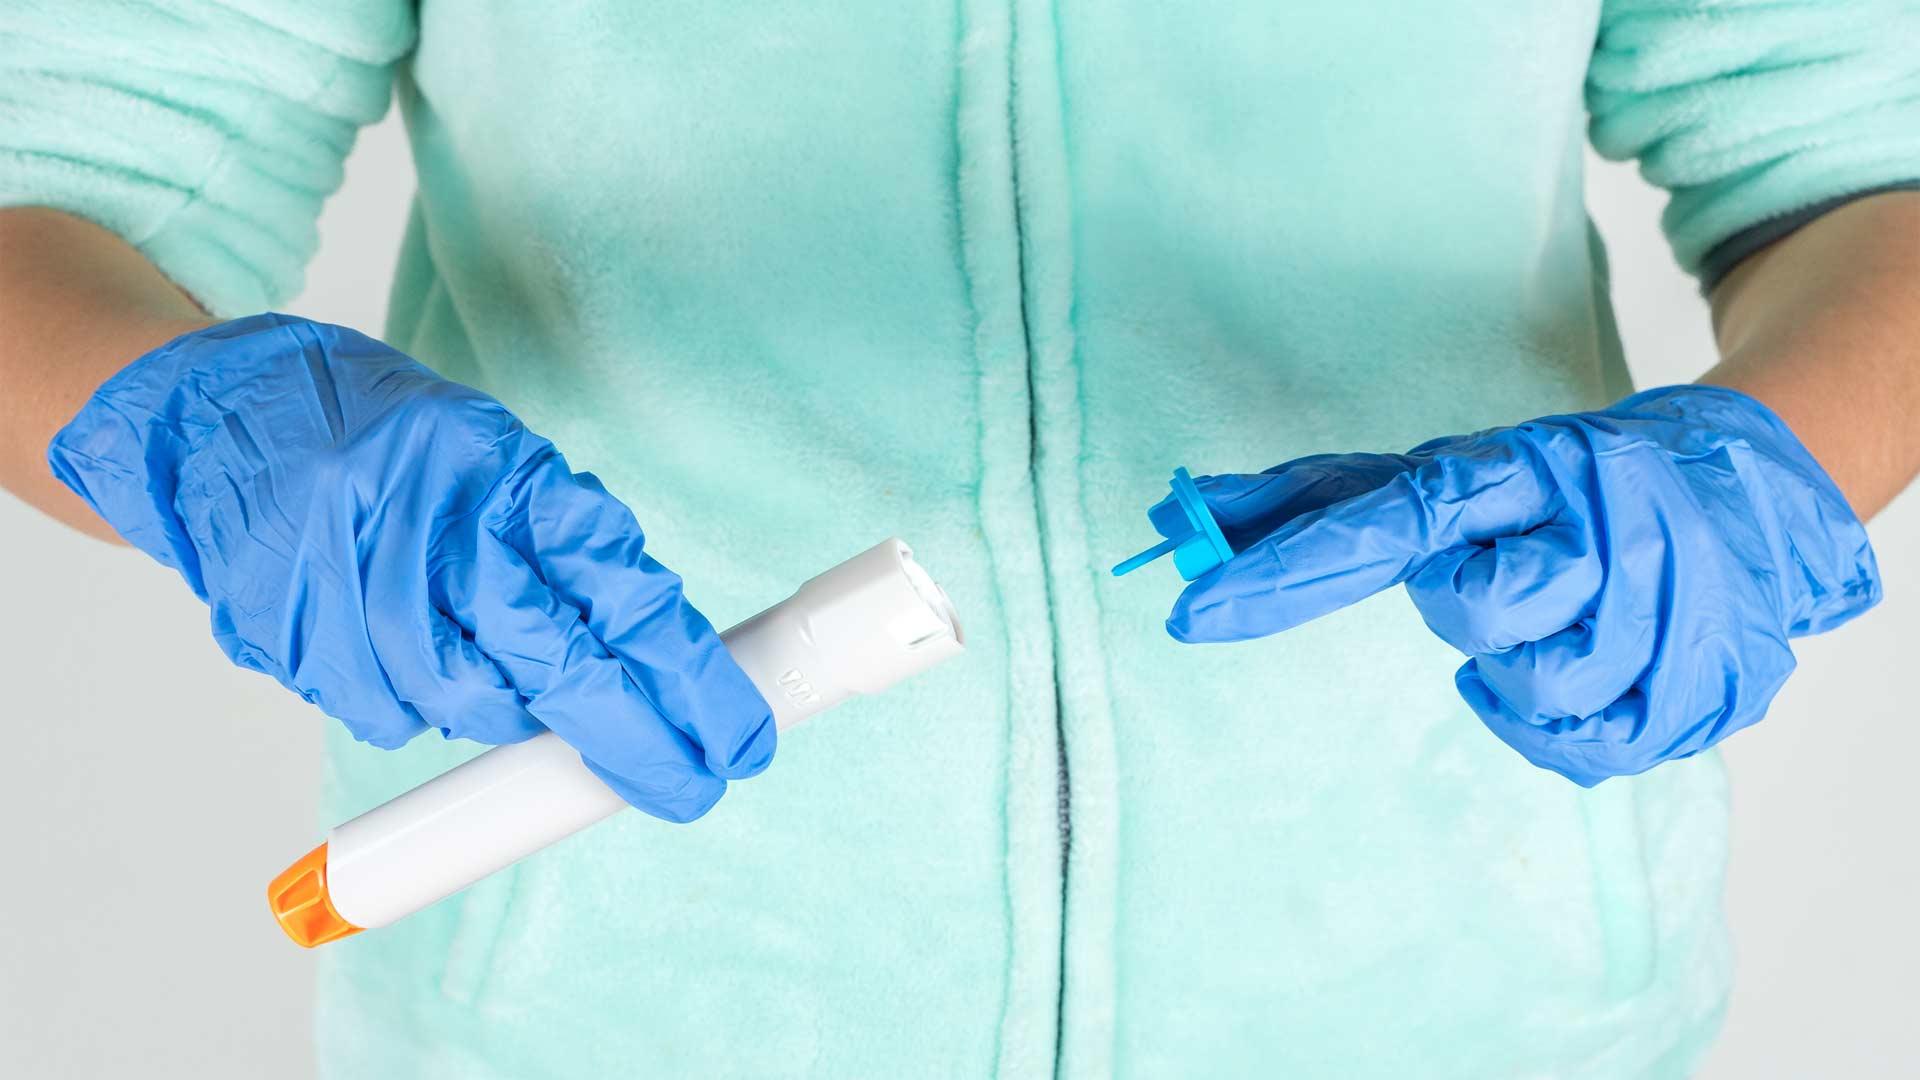 CDC updates COVID vaccine protocols to address 'severe allergic reactions' – Alaska Watchman